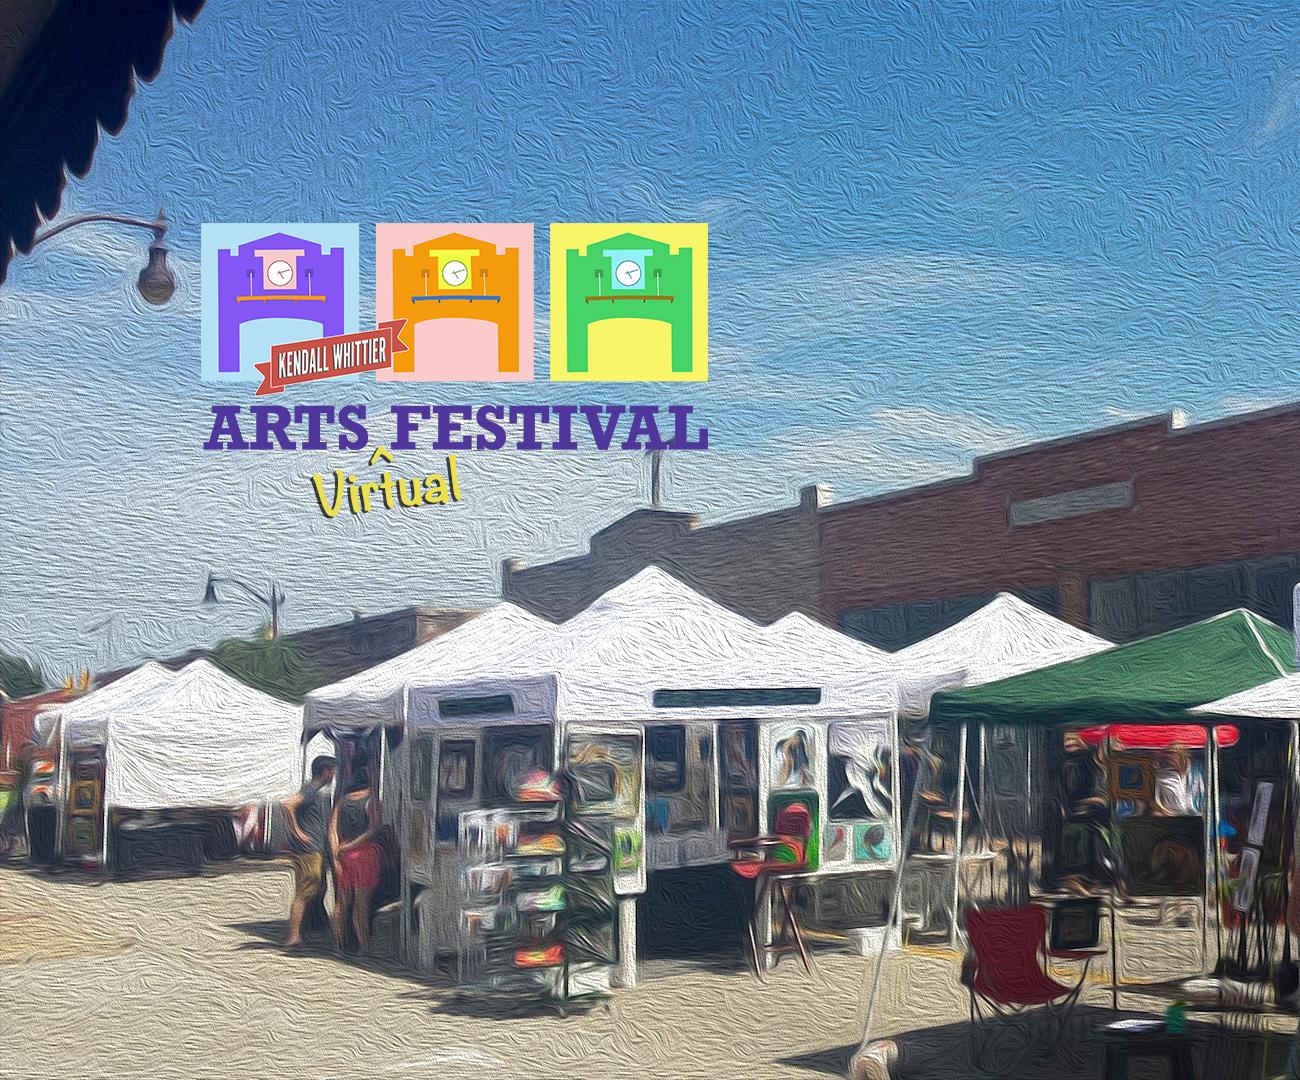 Kendall Whittier Arts Festival goes virtual